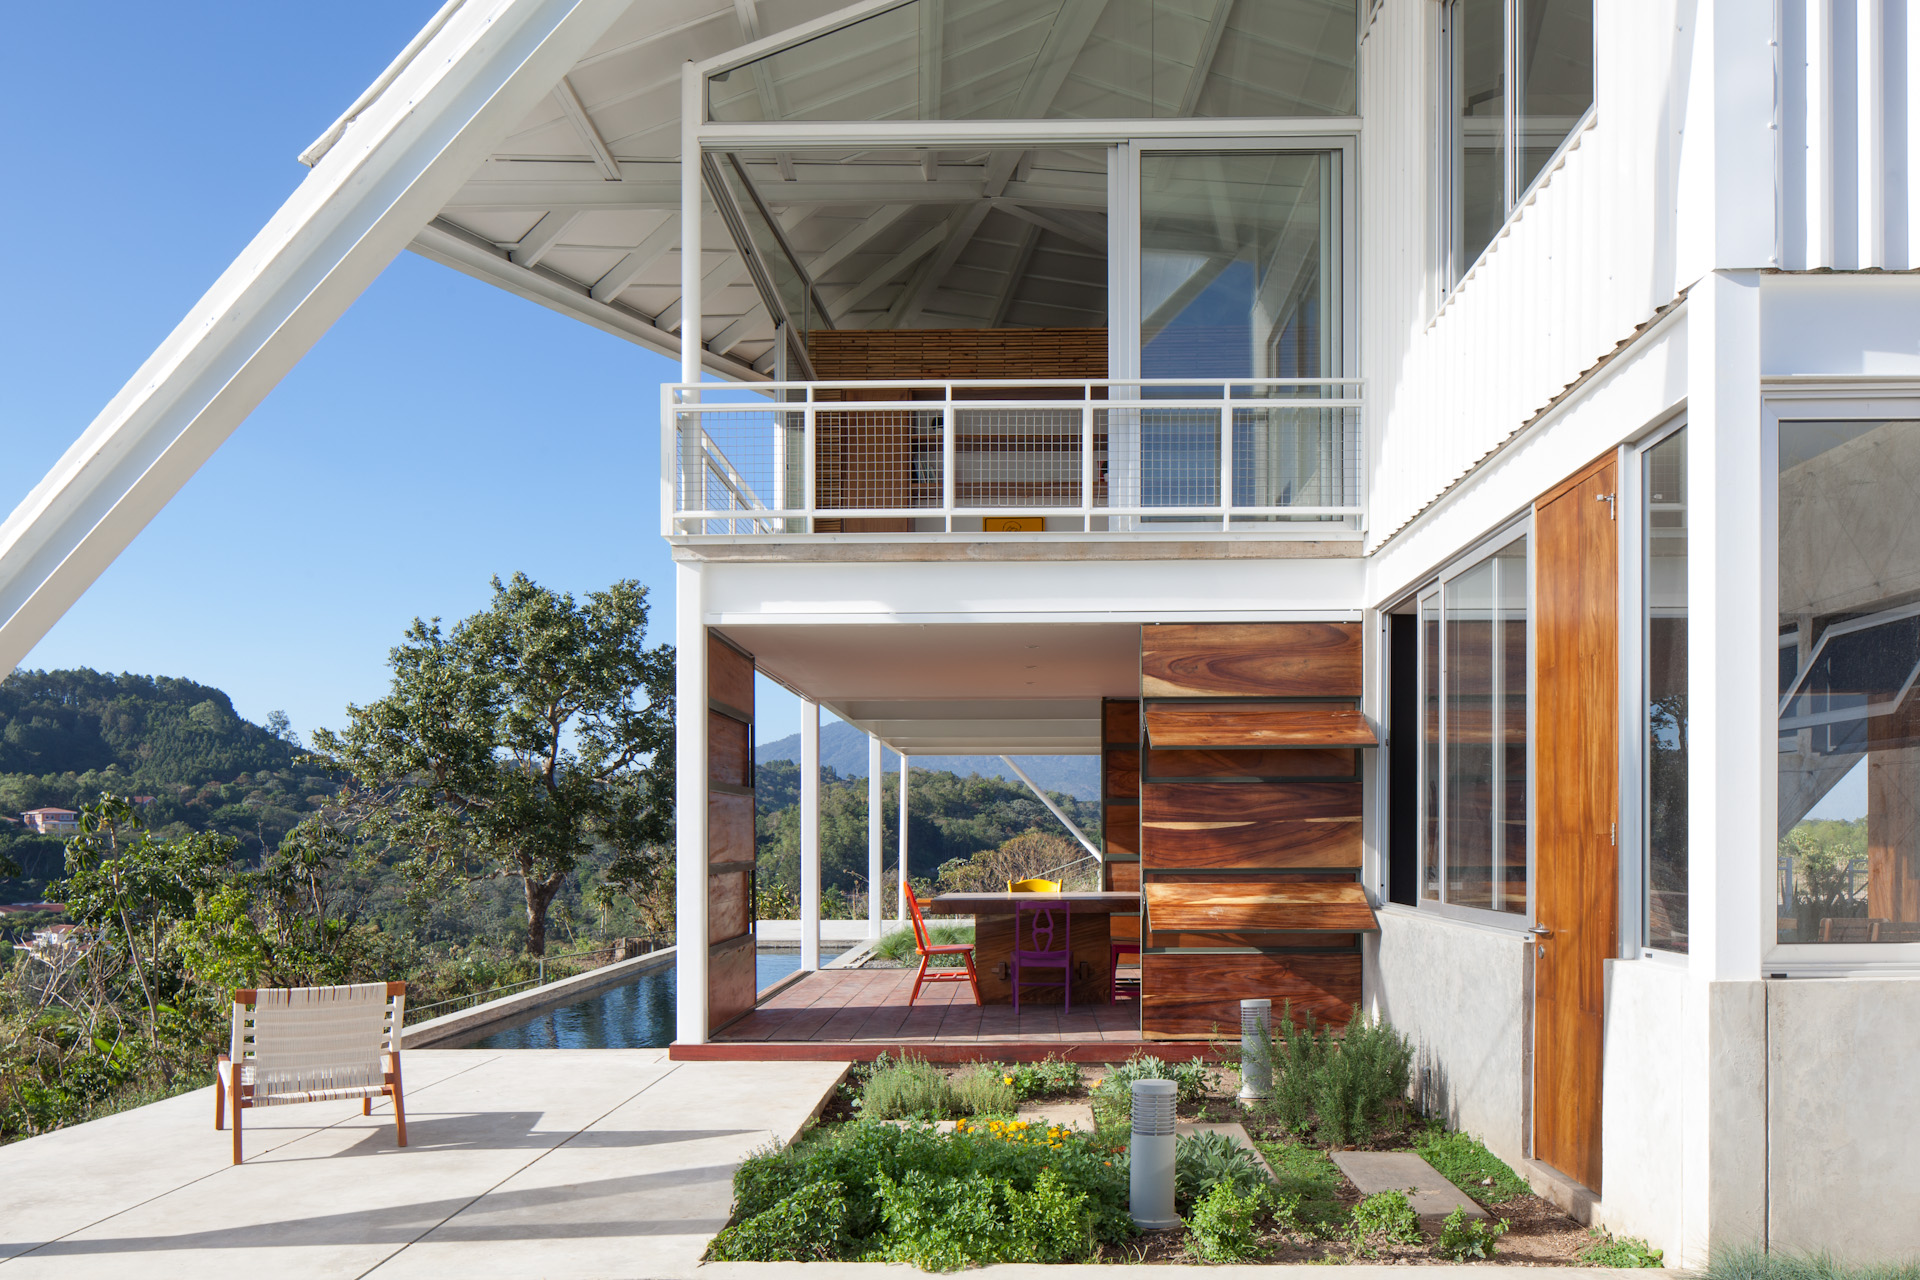 Architecture-Modern-La-Piscucha-El-Salvador-Jason-Bax-Dwell-06.JPG